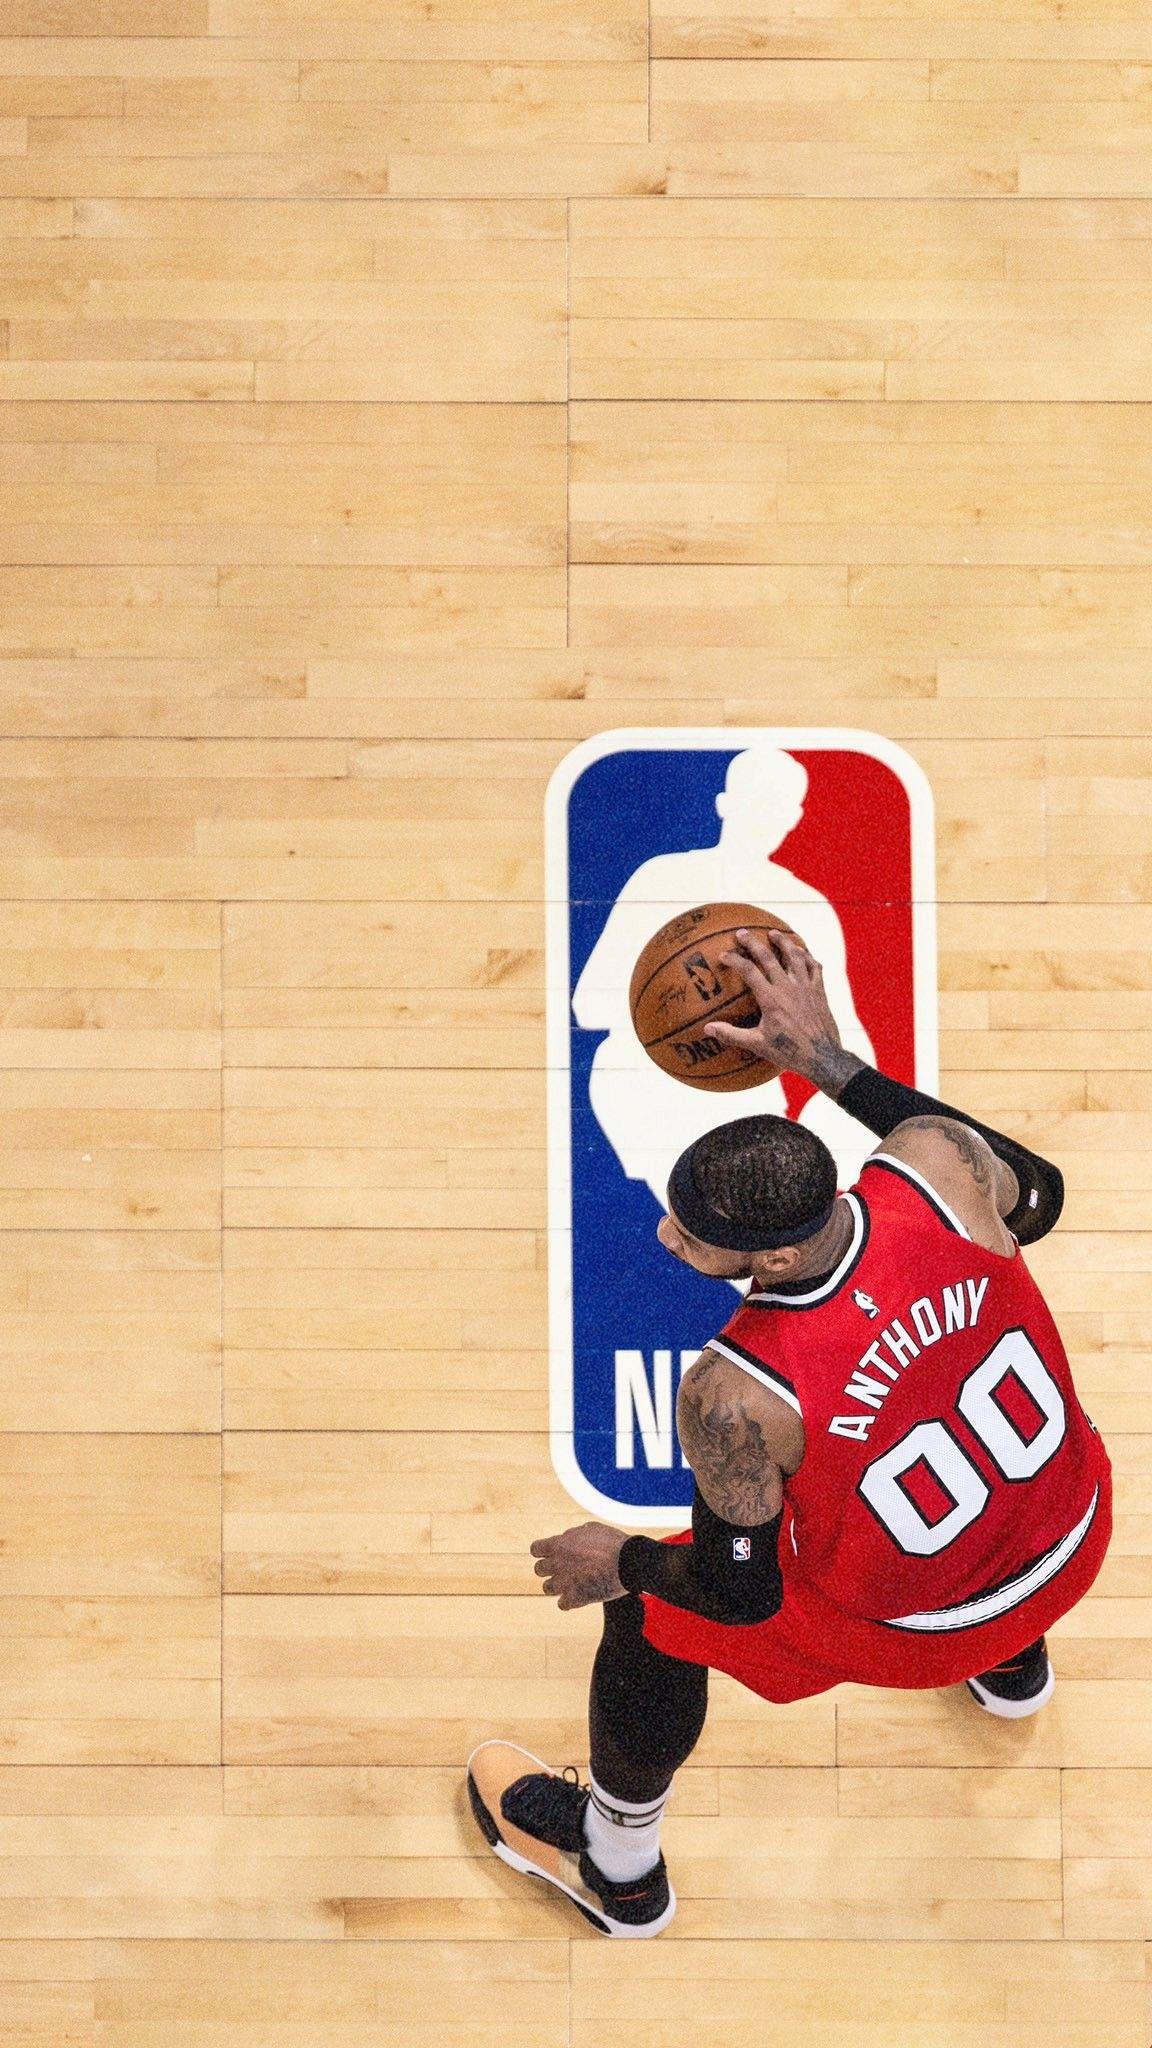 Carmelo Anthony Wallpaper Carmelo Anthony Wallpaper Nba Basketball Art Jordan Logo Wallpaper